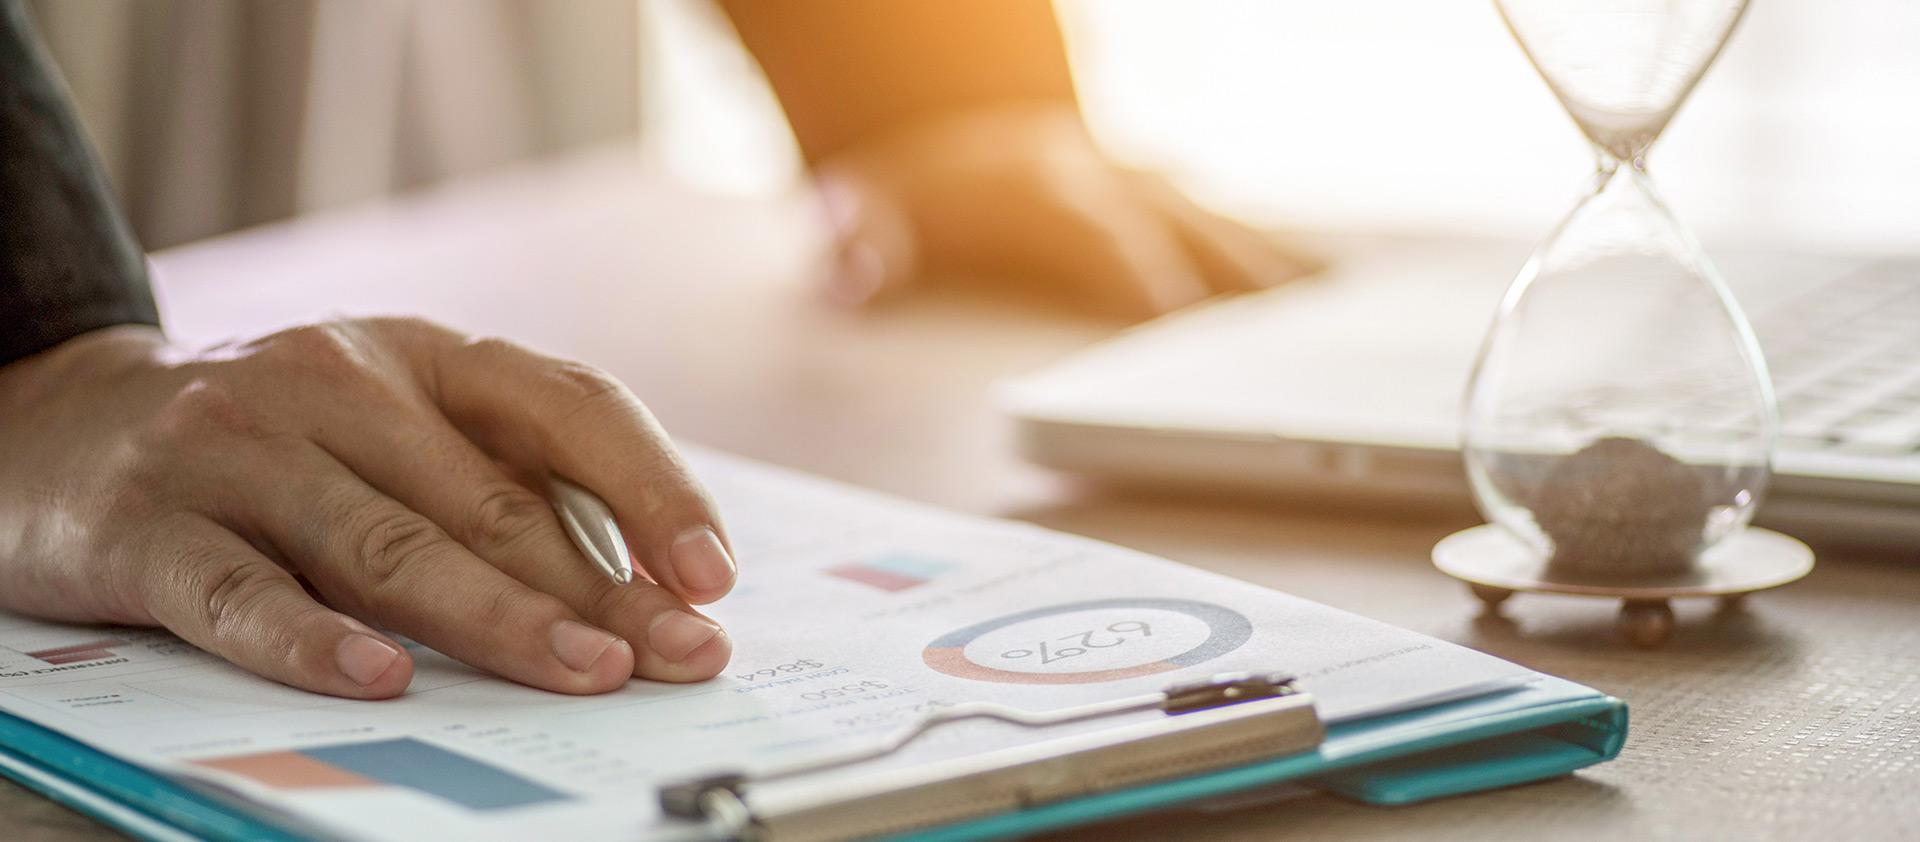 Public company audits